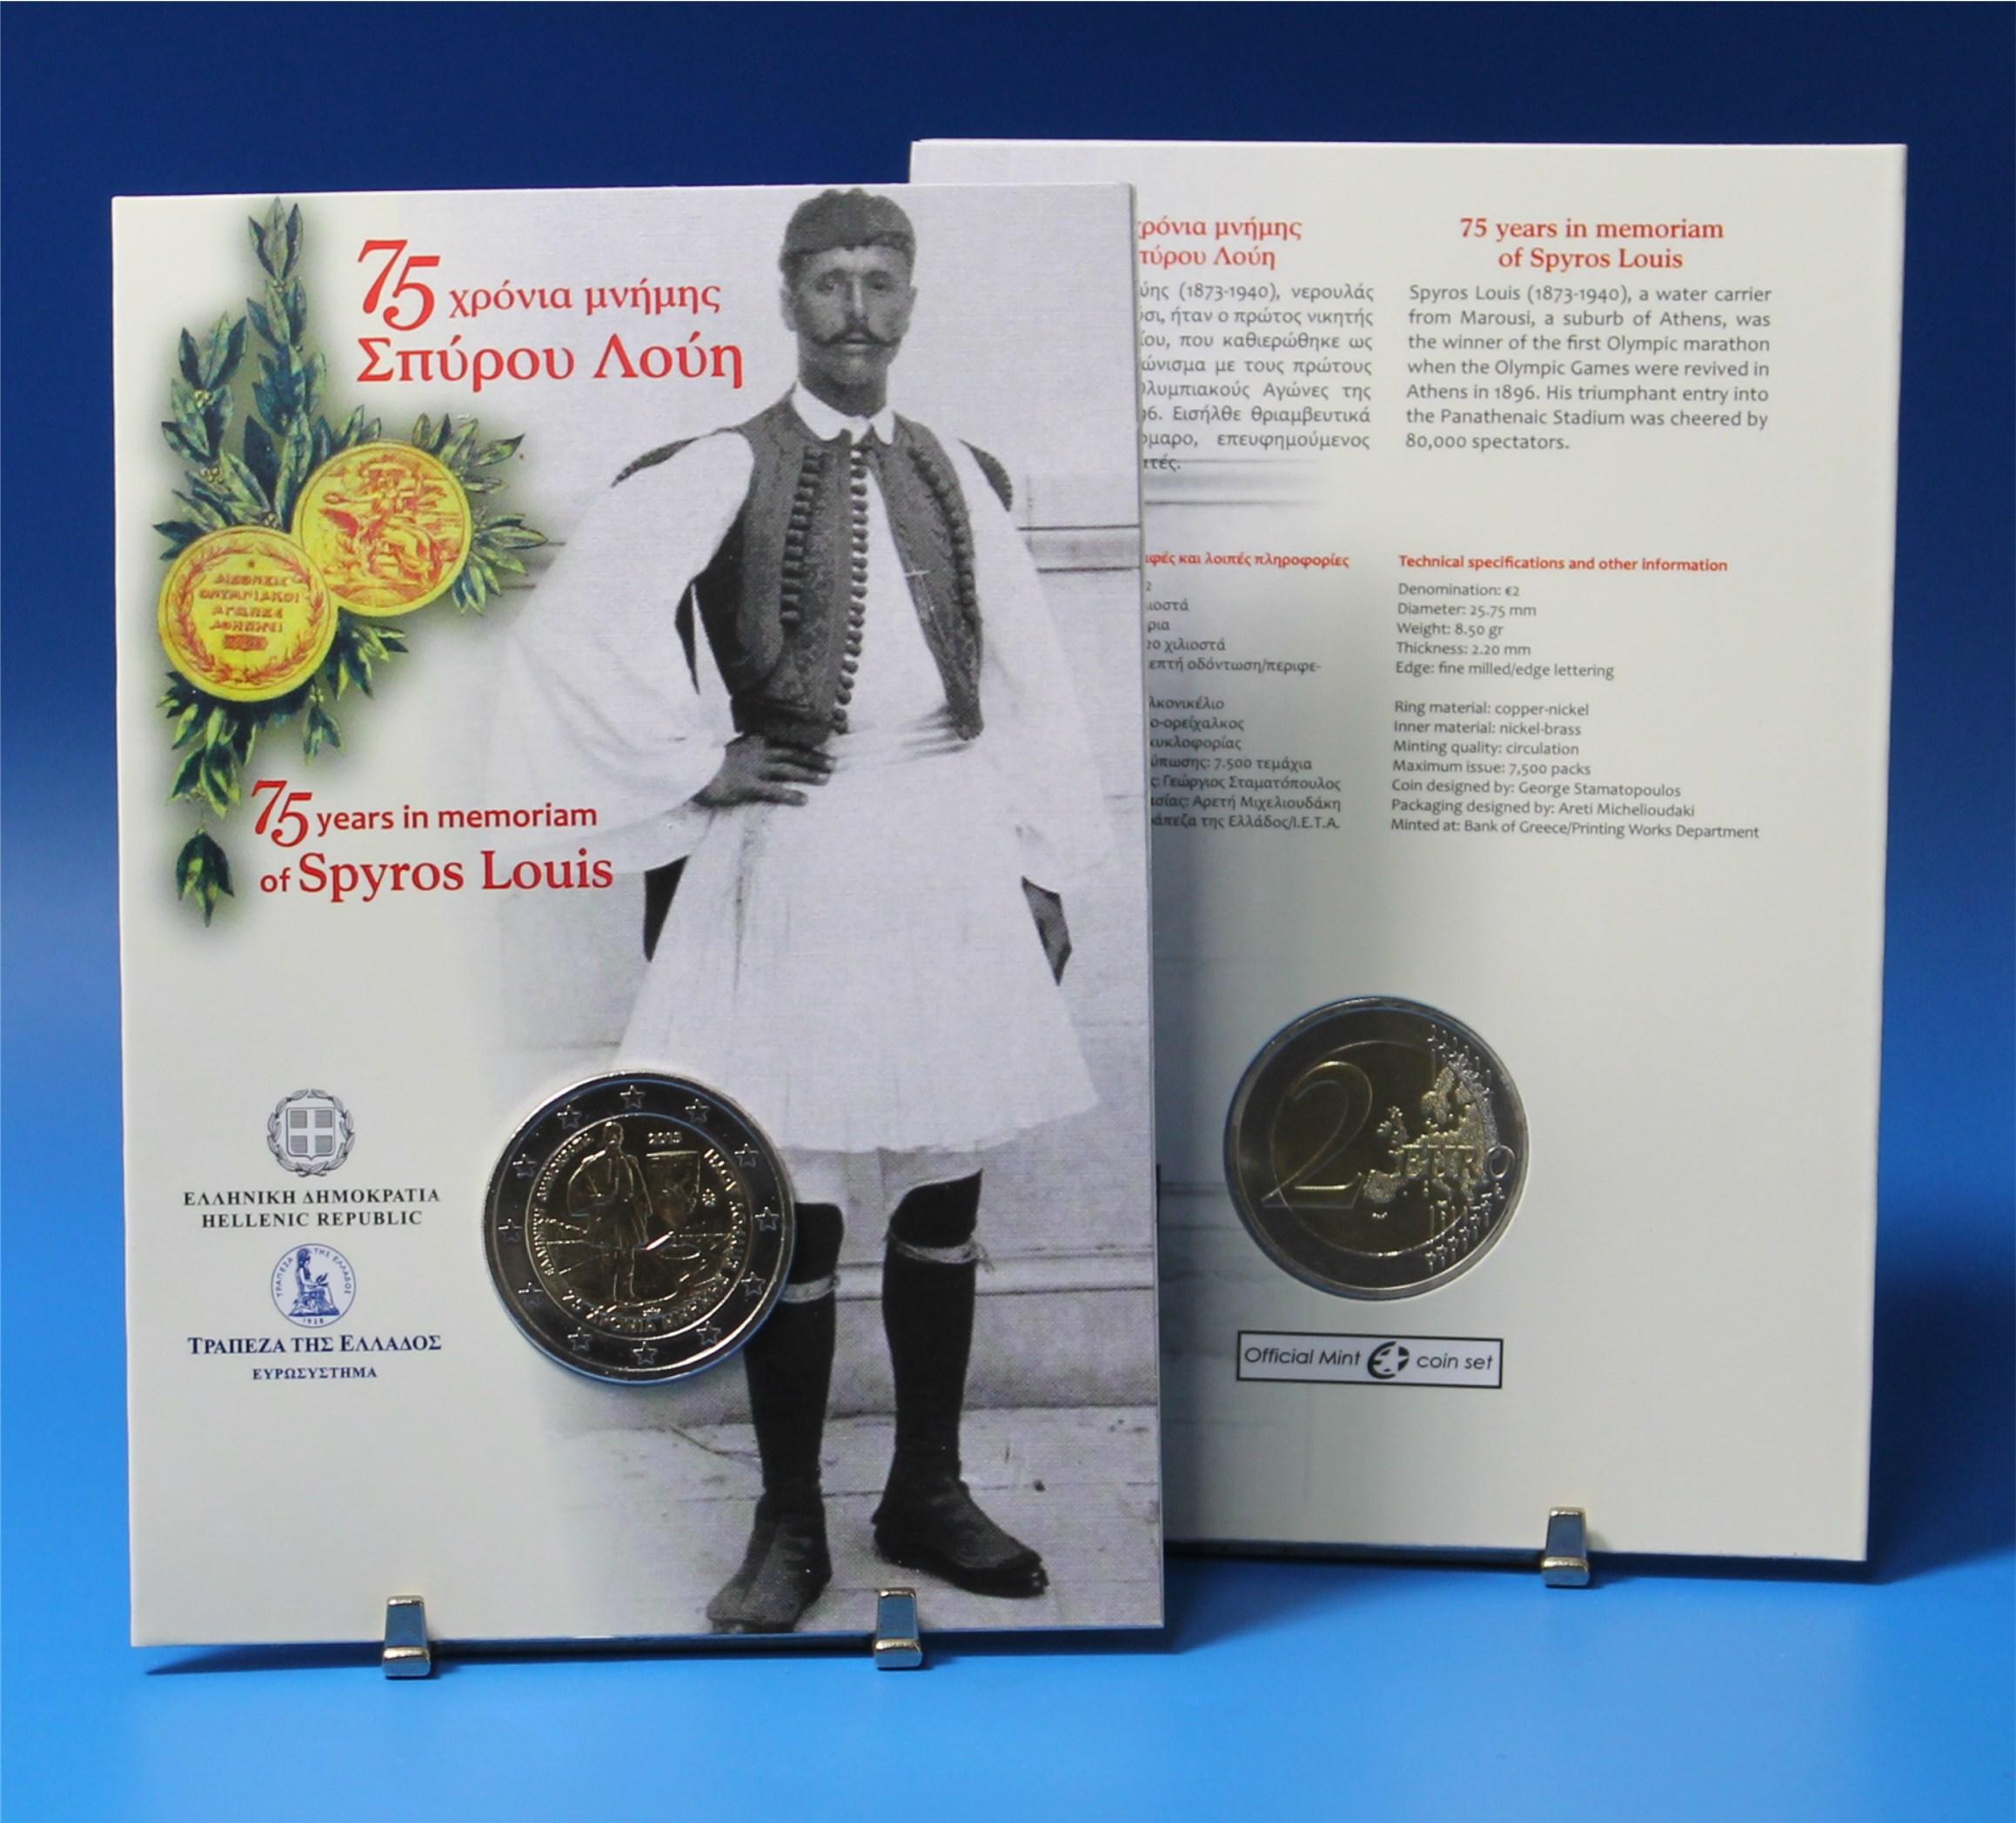 Coin Card 2 Ευρώ, Σπύρος Λουης, Ελλάδα 2015 2 ευρώ